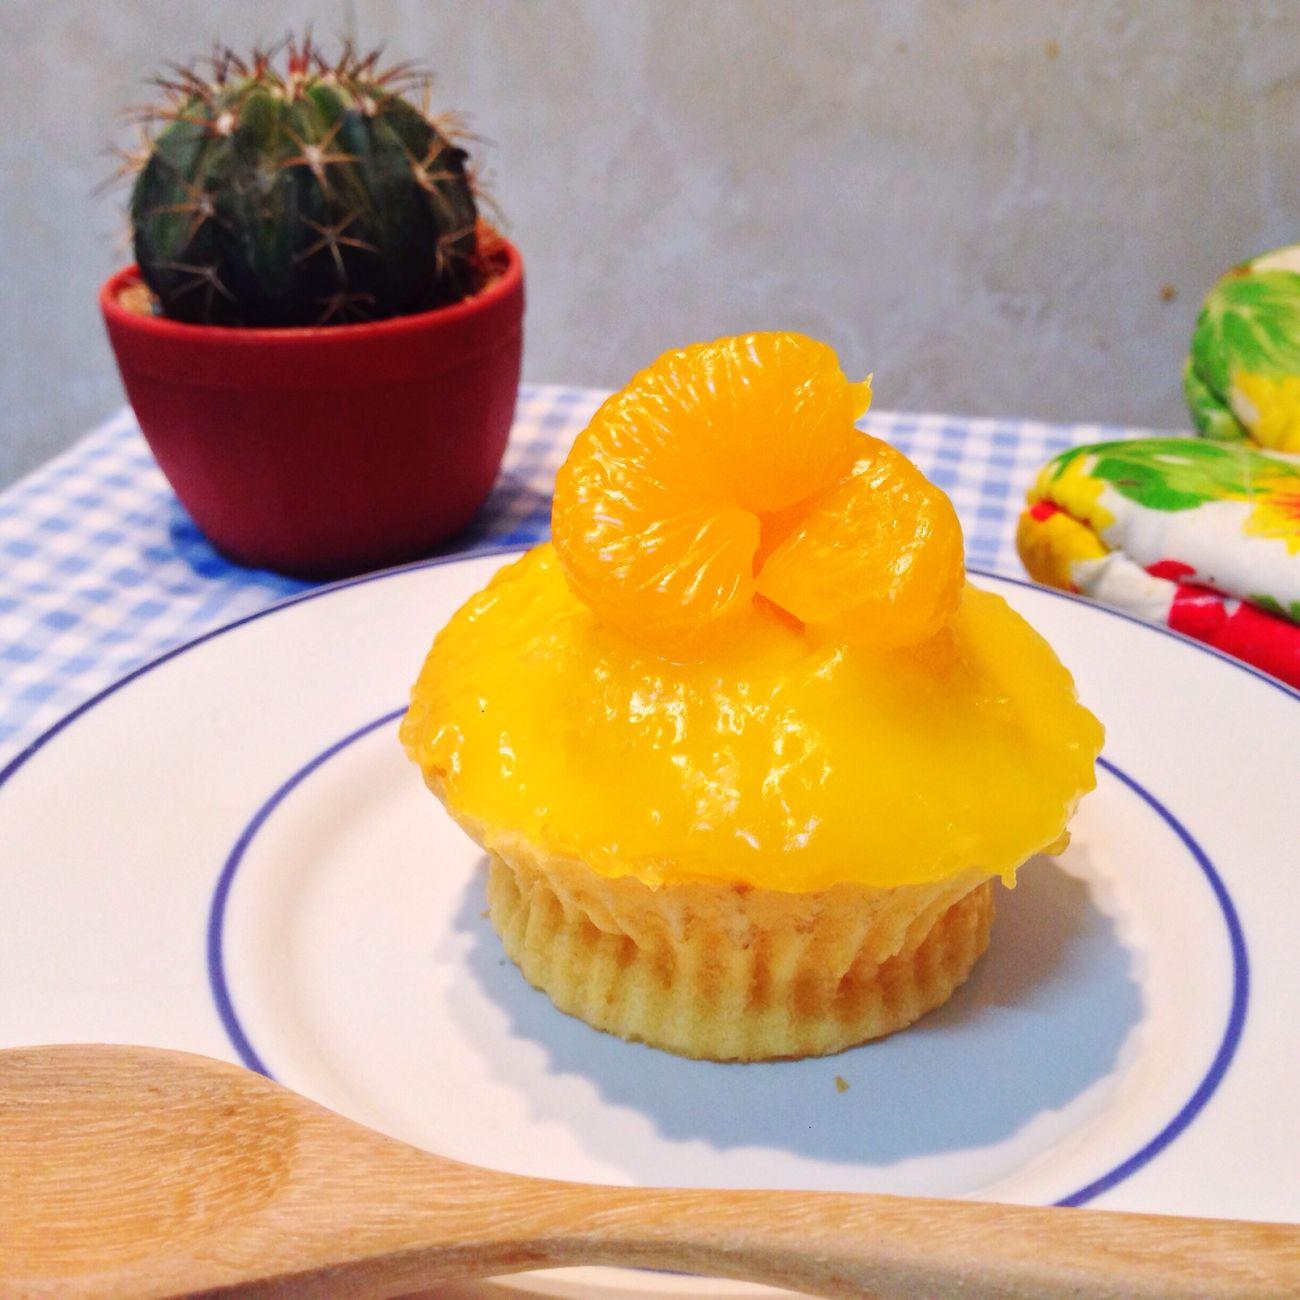 Orange Cupcake Orang Cupcakes Homemade Homemade Cake